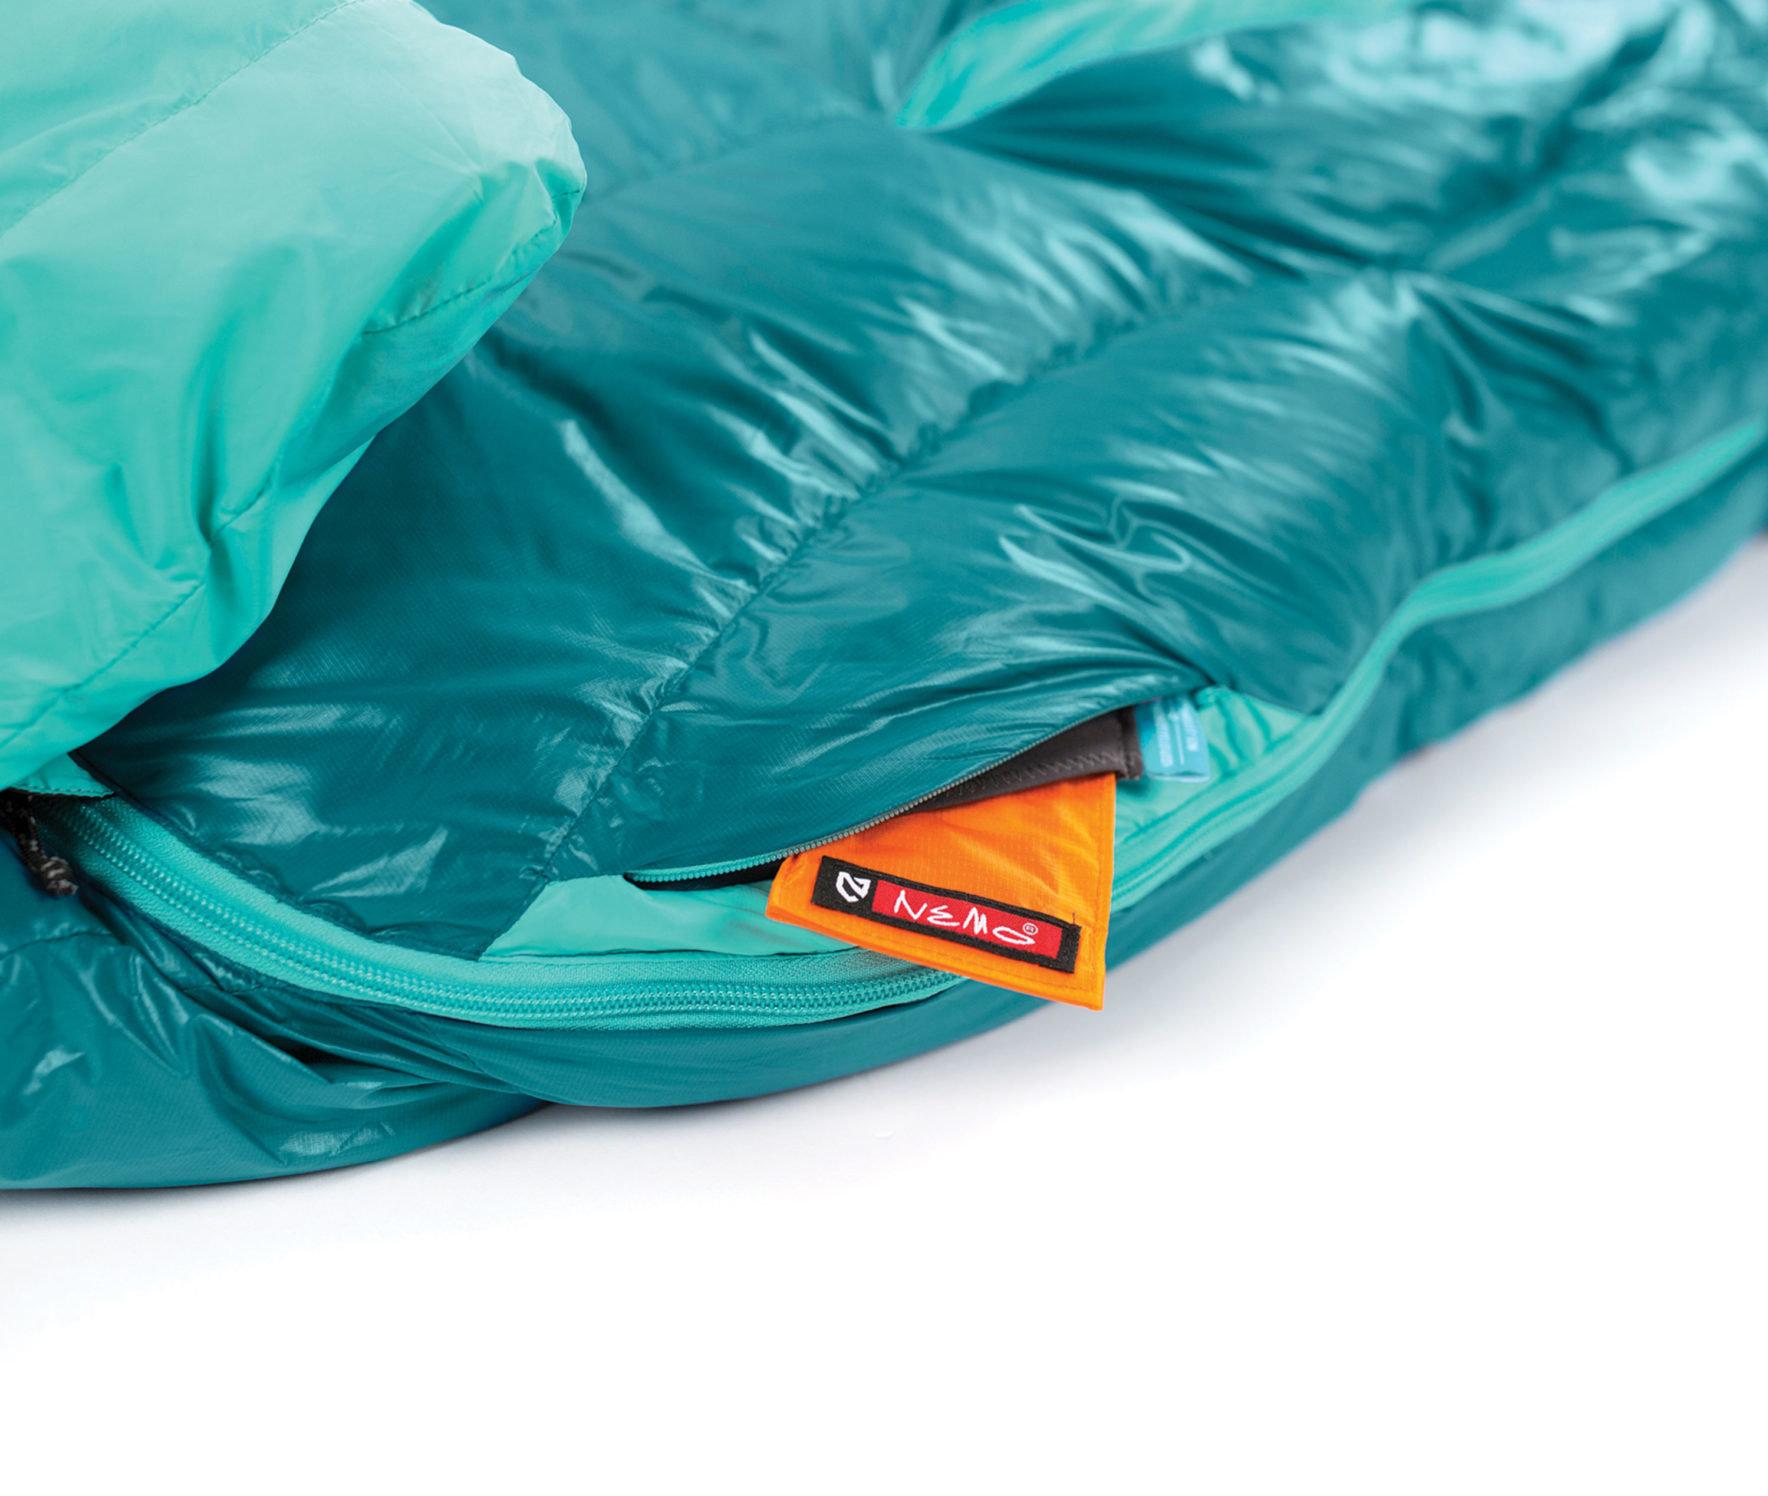 NEMO Rave Women's Down Sleeping Bag